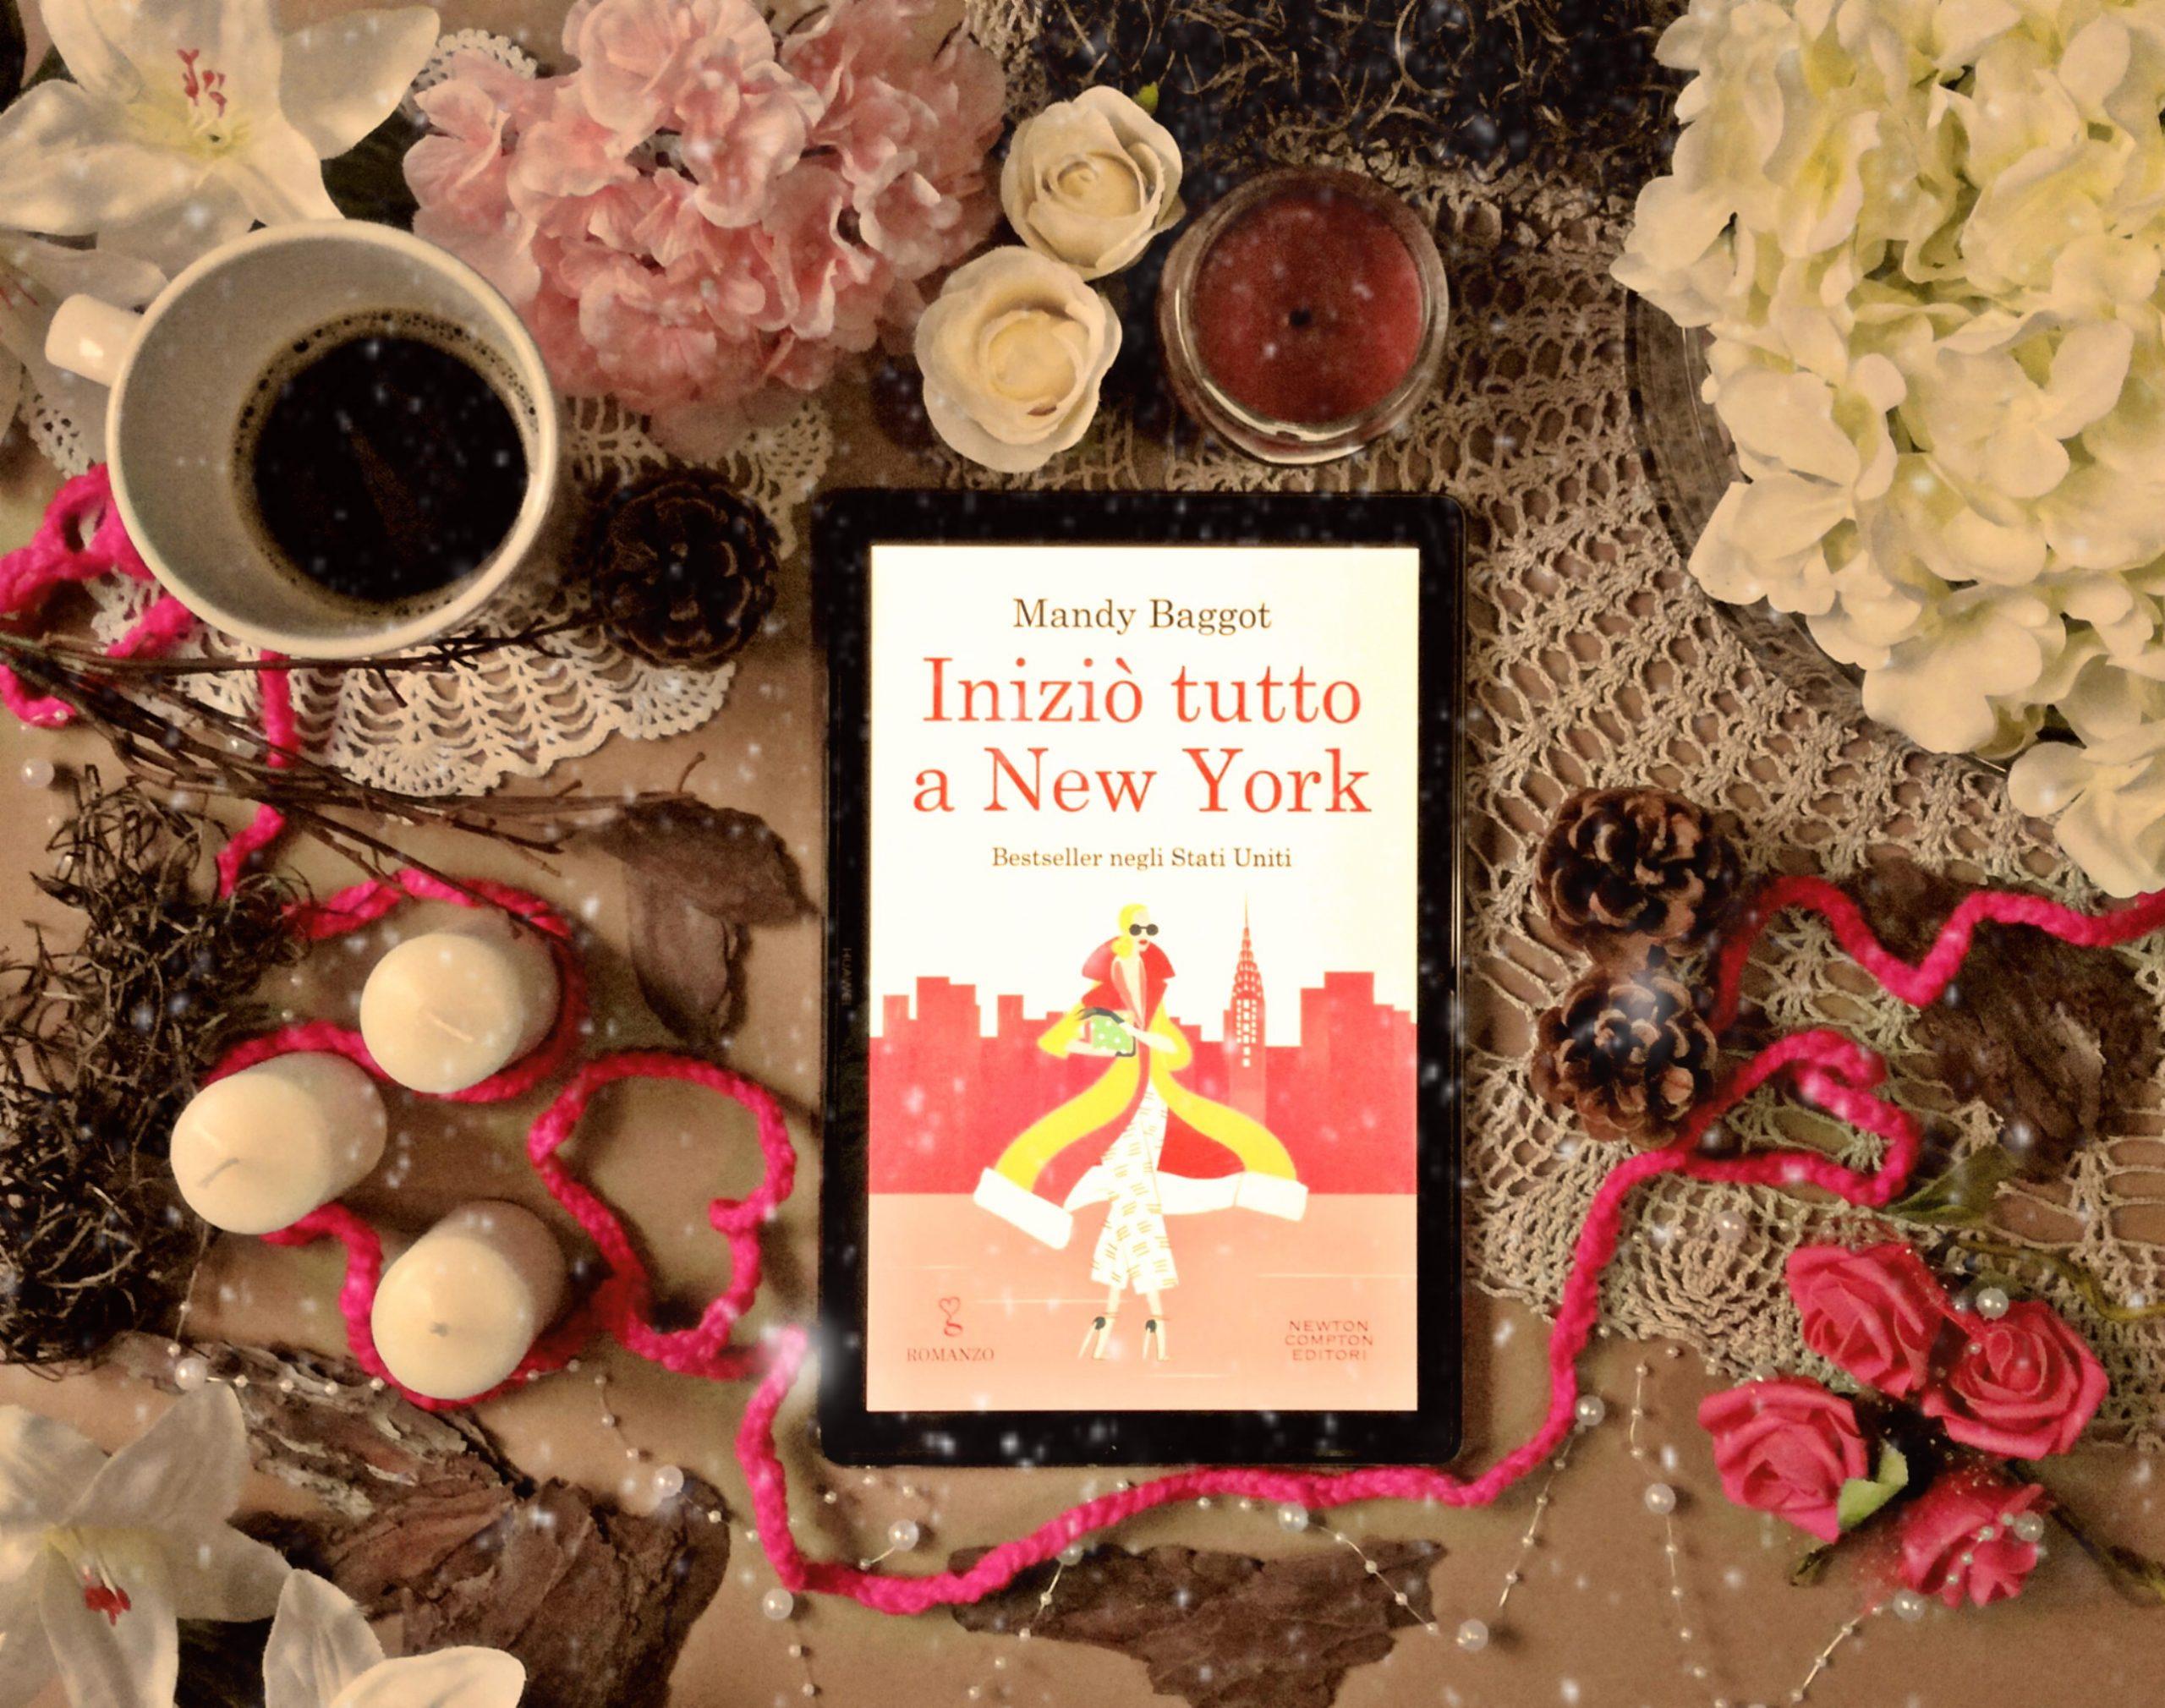 Iniziò tutto a New York – Mandy Baggot